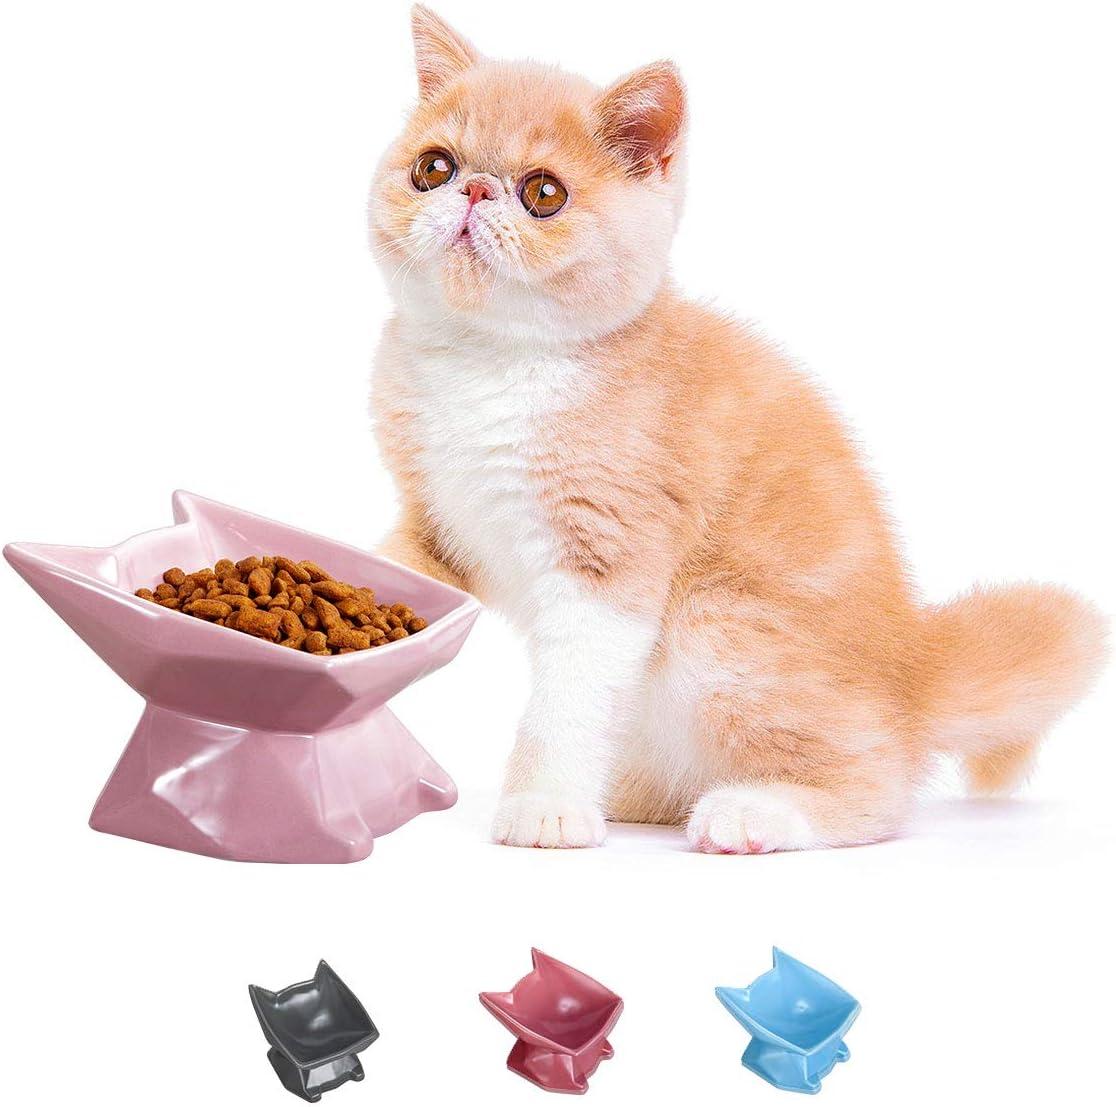 Jemirry Raised Cat Bowl Cat Ear Shape Ceramic Cat Bowl Cat Dish with Tilt Angle for Persian Garfield Chinchilla Kitten-Dark Grey